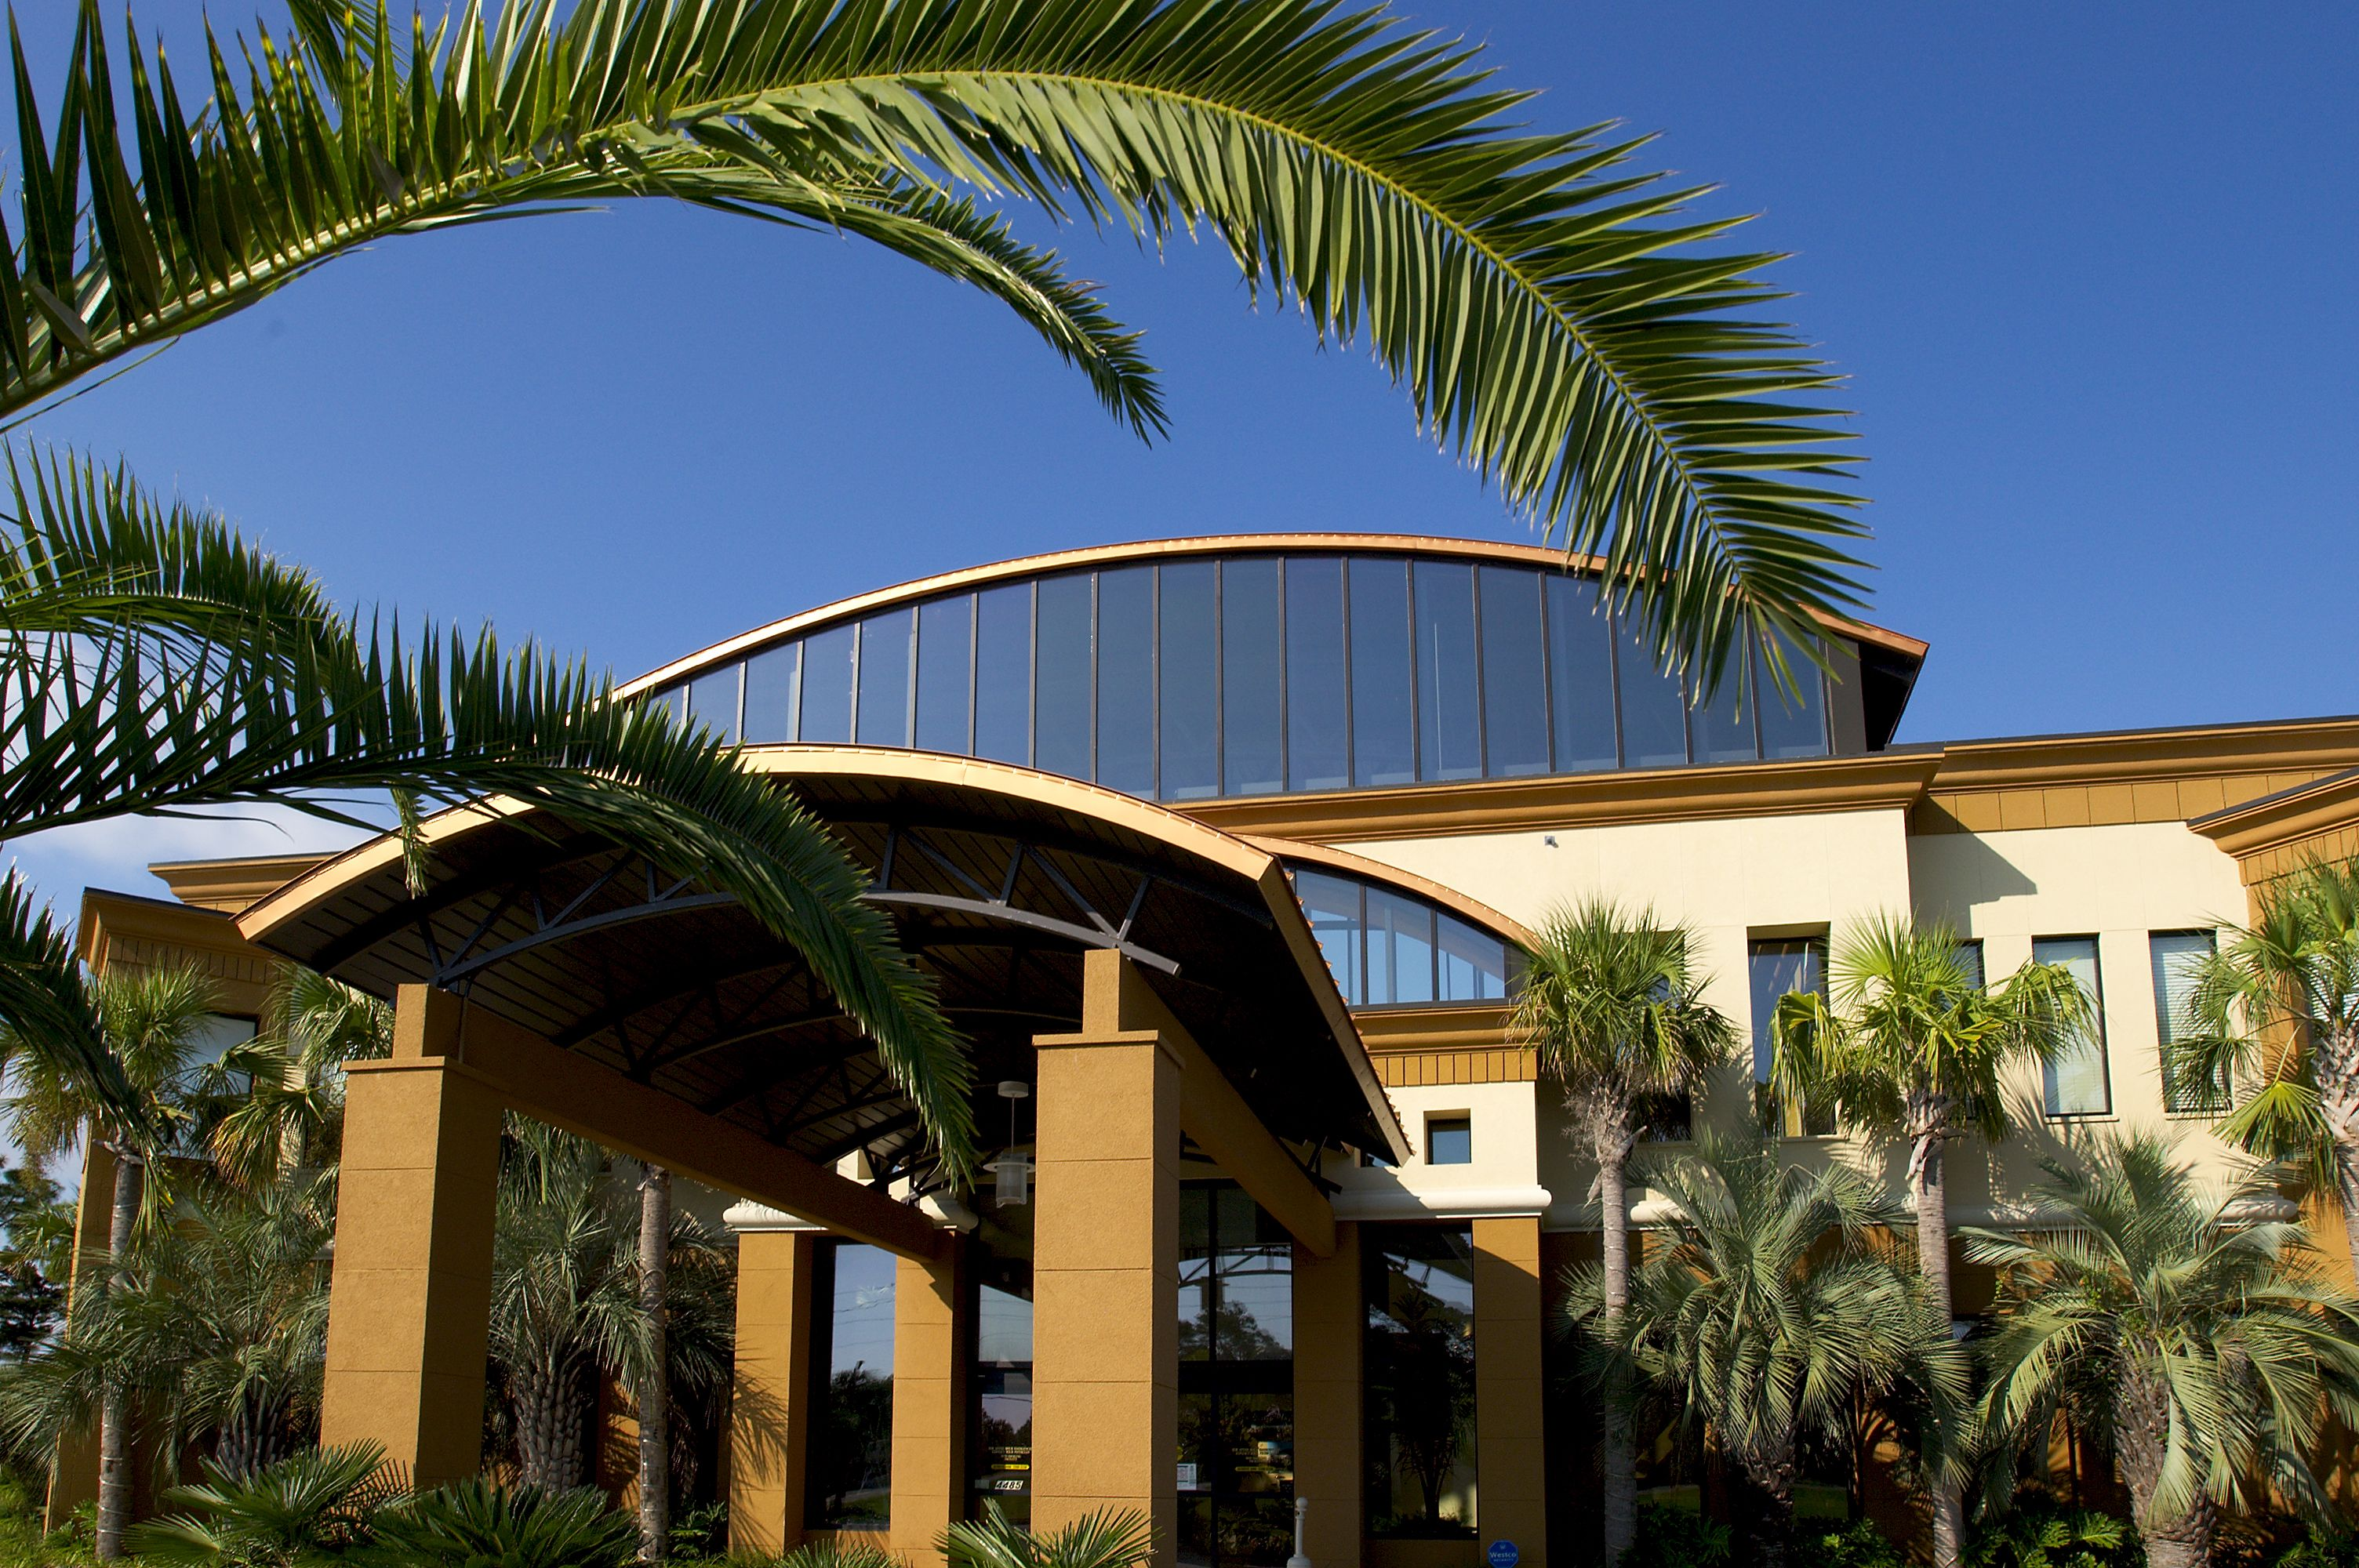 City of Destin in Florida